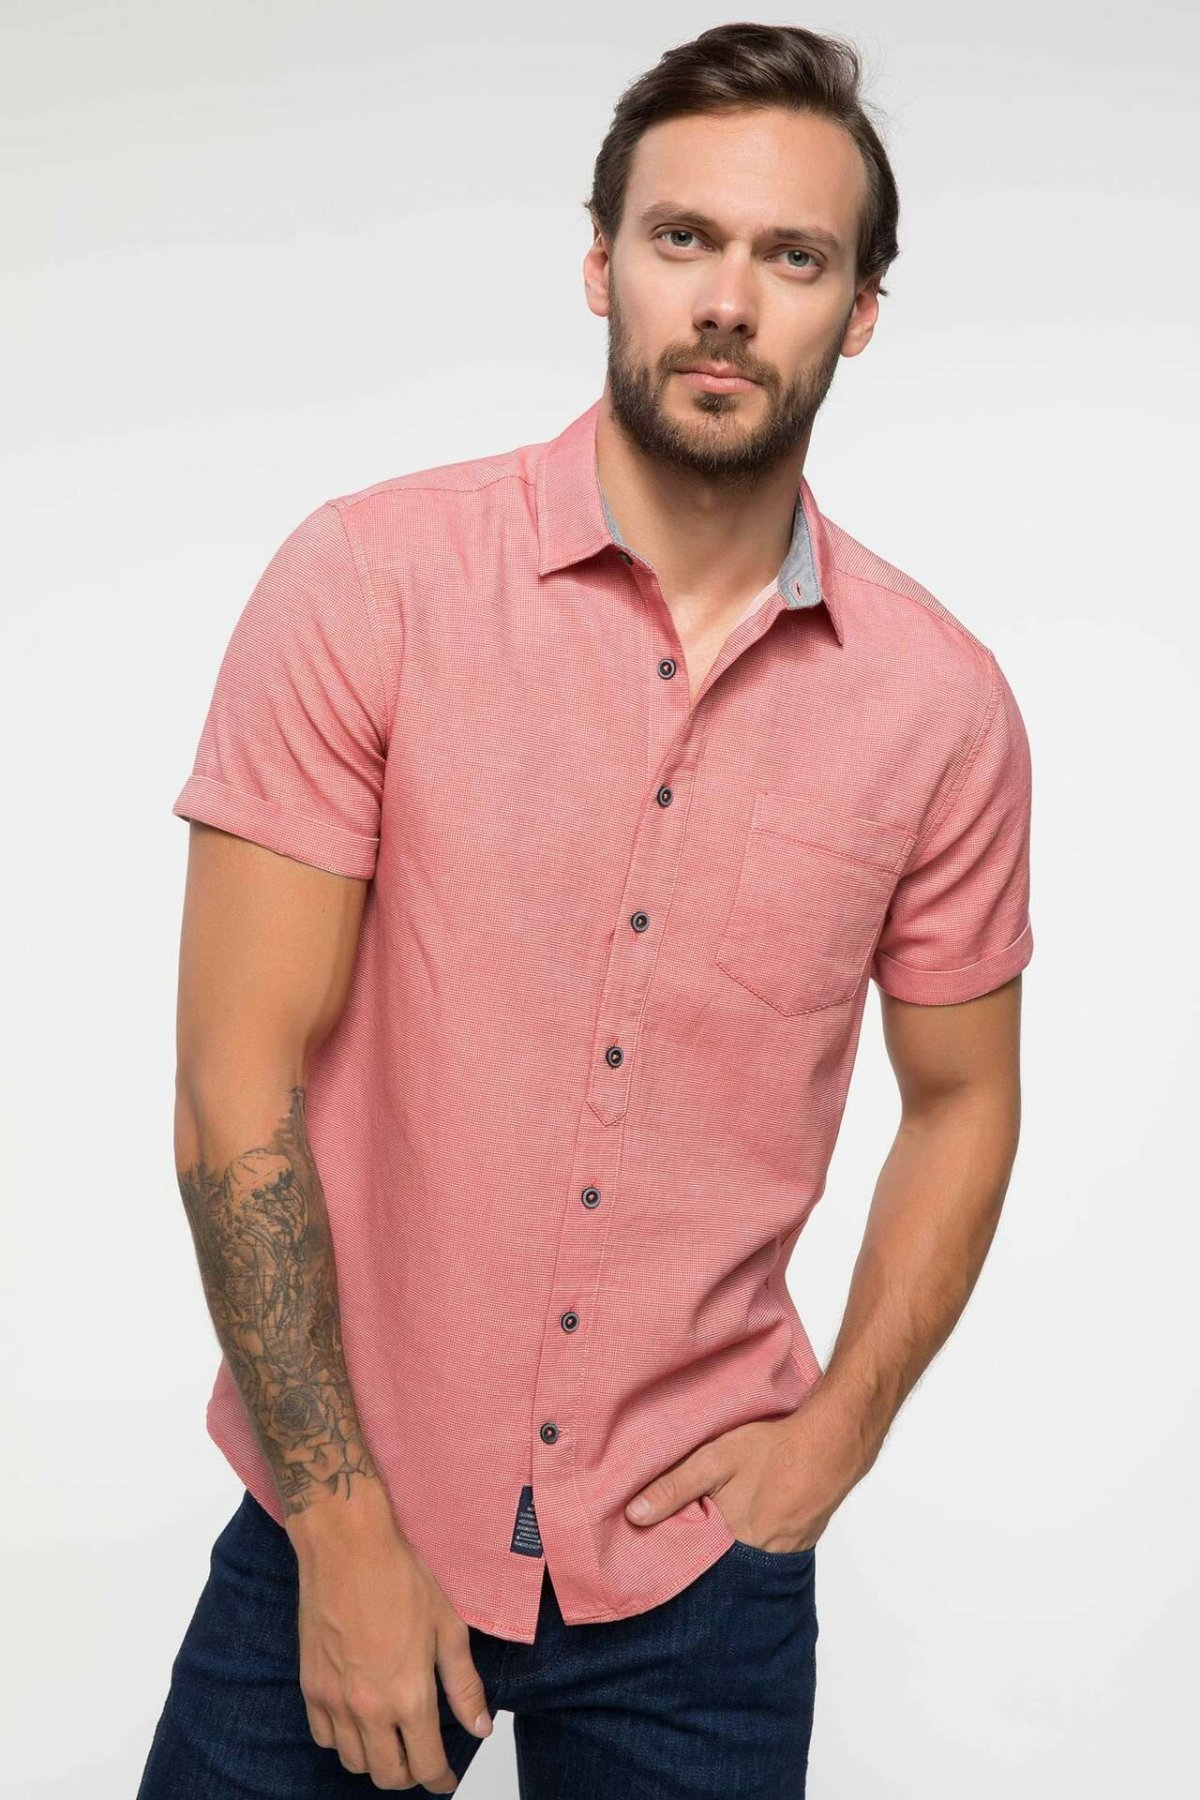 DeFacto Fashion Man Short Sleeve Shirt For Men's Casual Solid Comfort Shirts Leisure Simple Joker Tops Male Summer-I9635AZ18SM